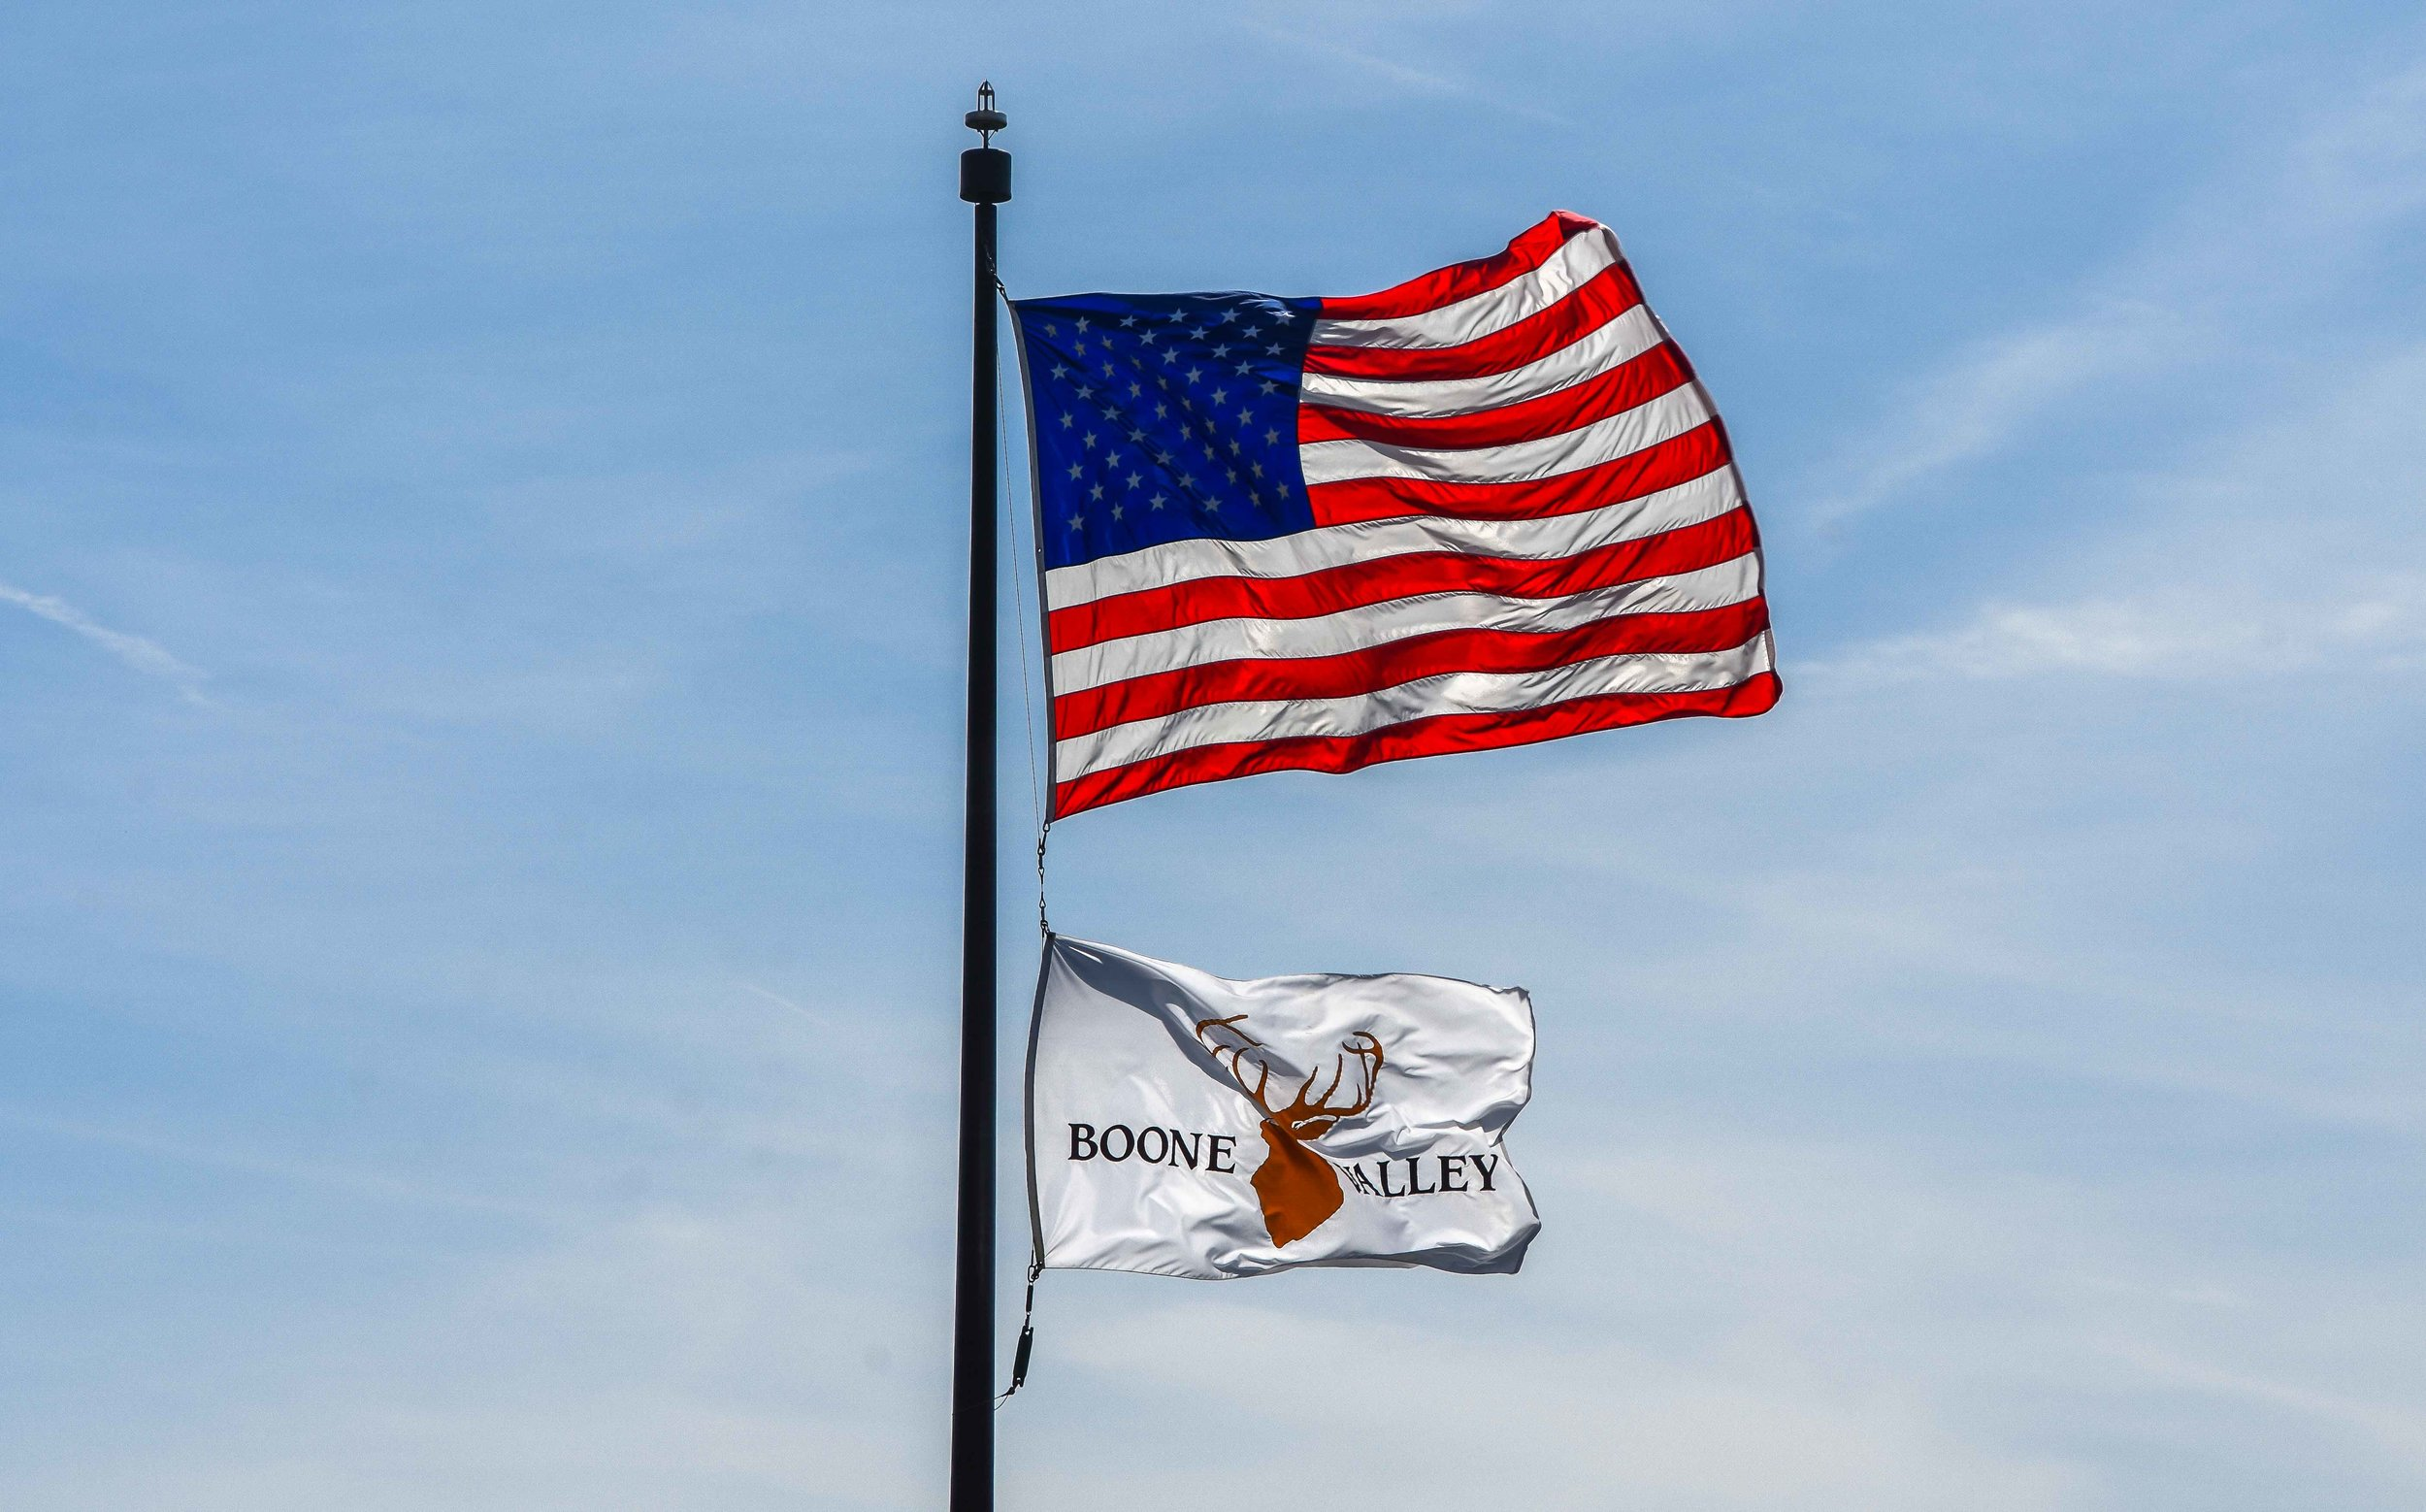 Boone Valley1-130.jpg